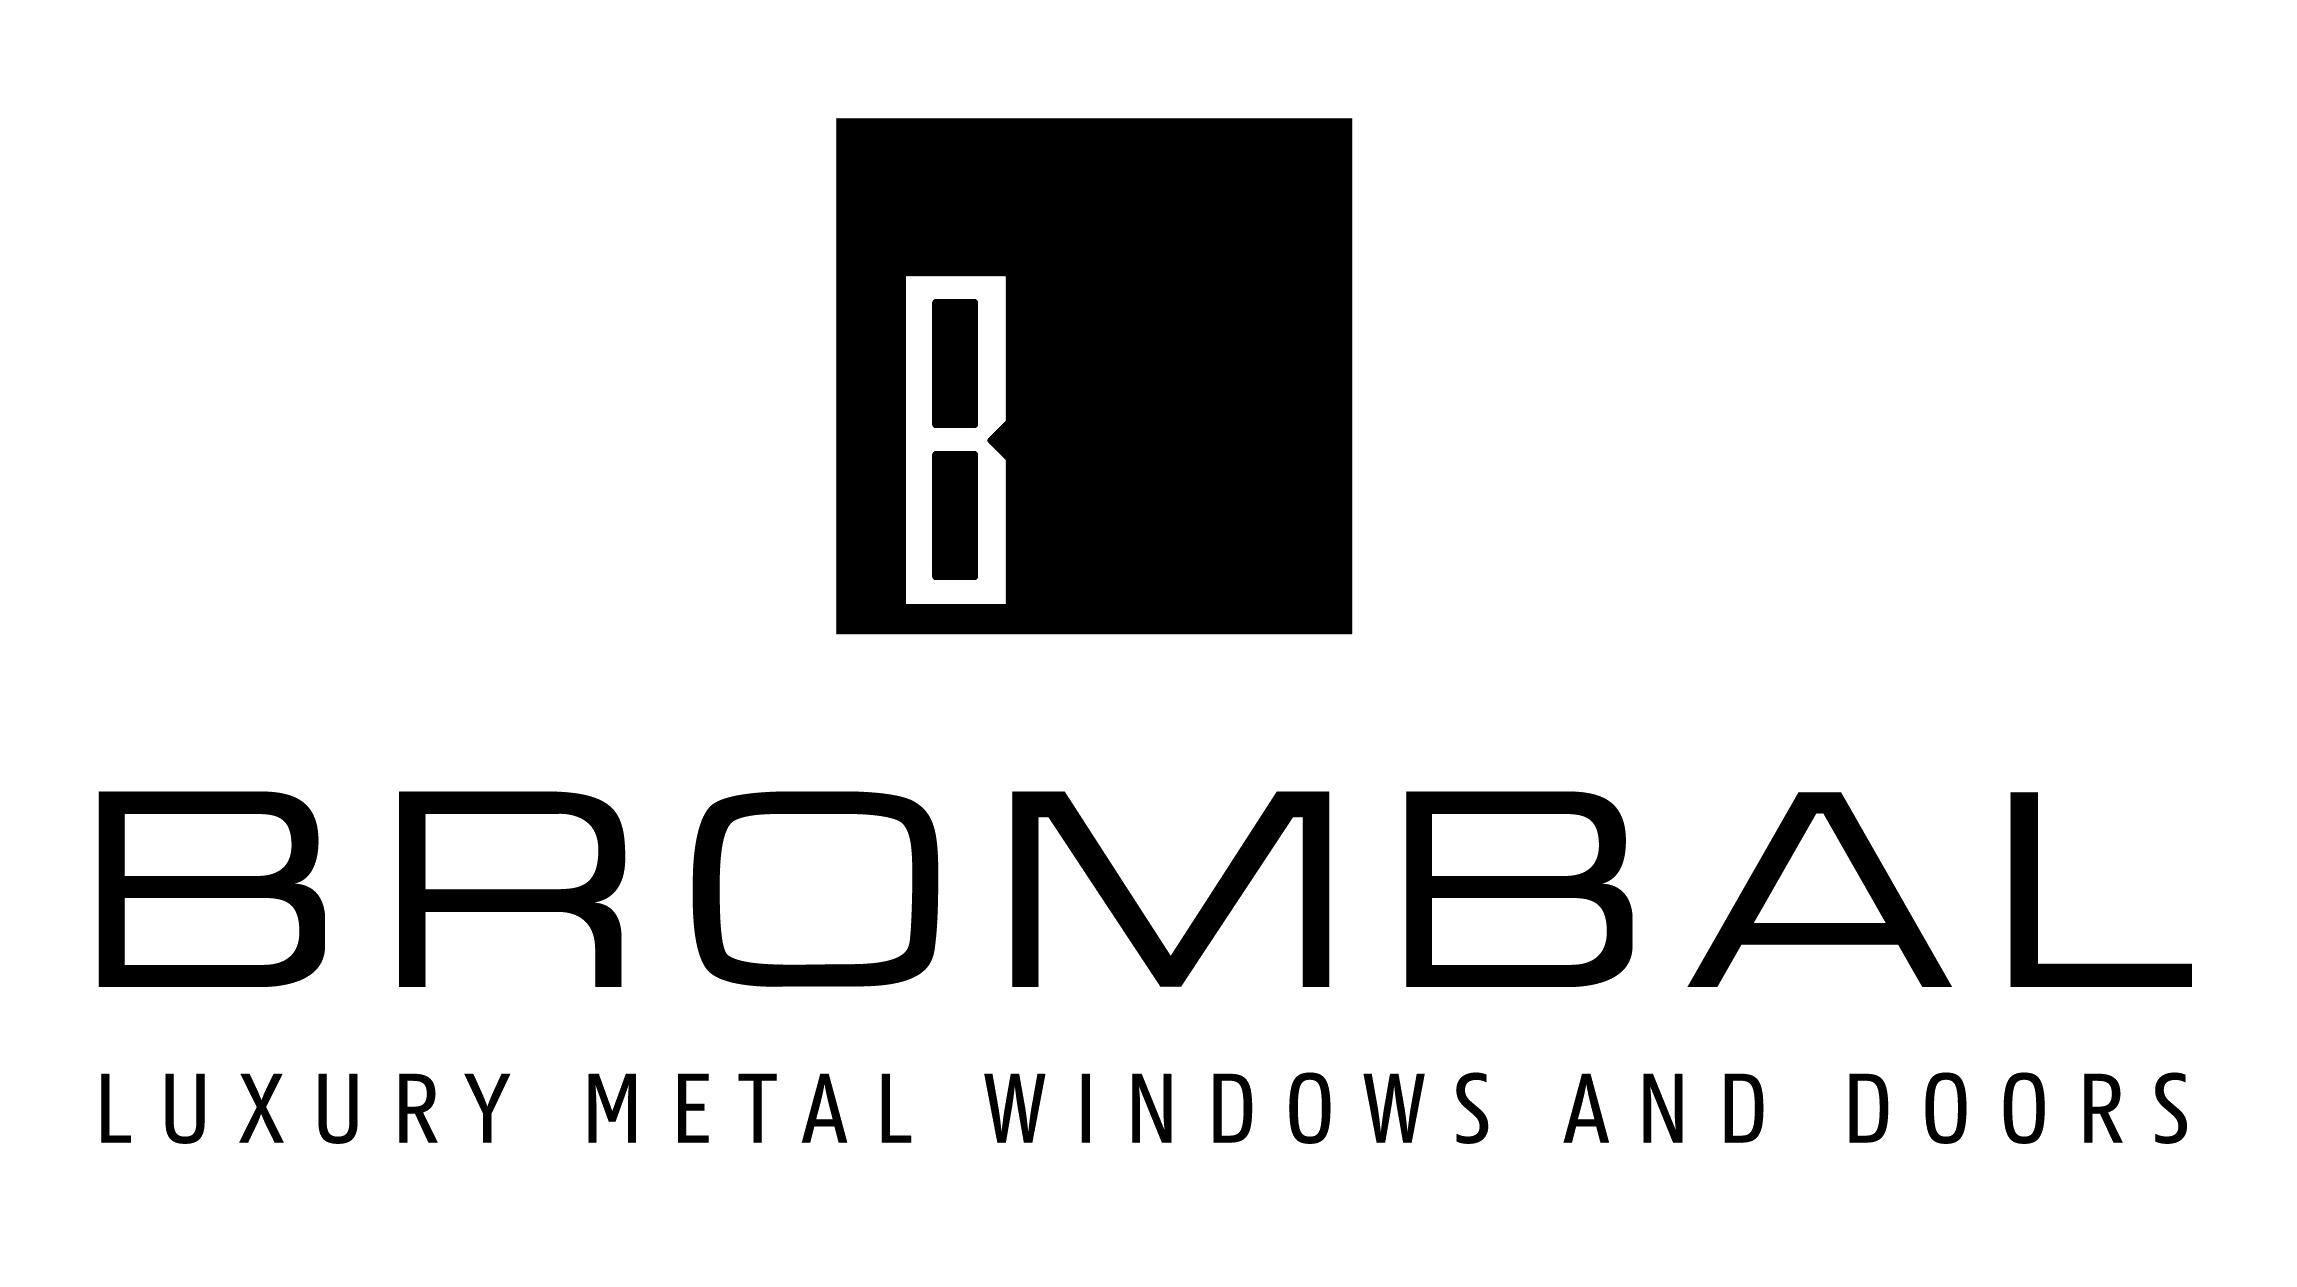 Brombal Luxury Metal Windows and Doors Logo